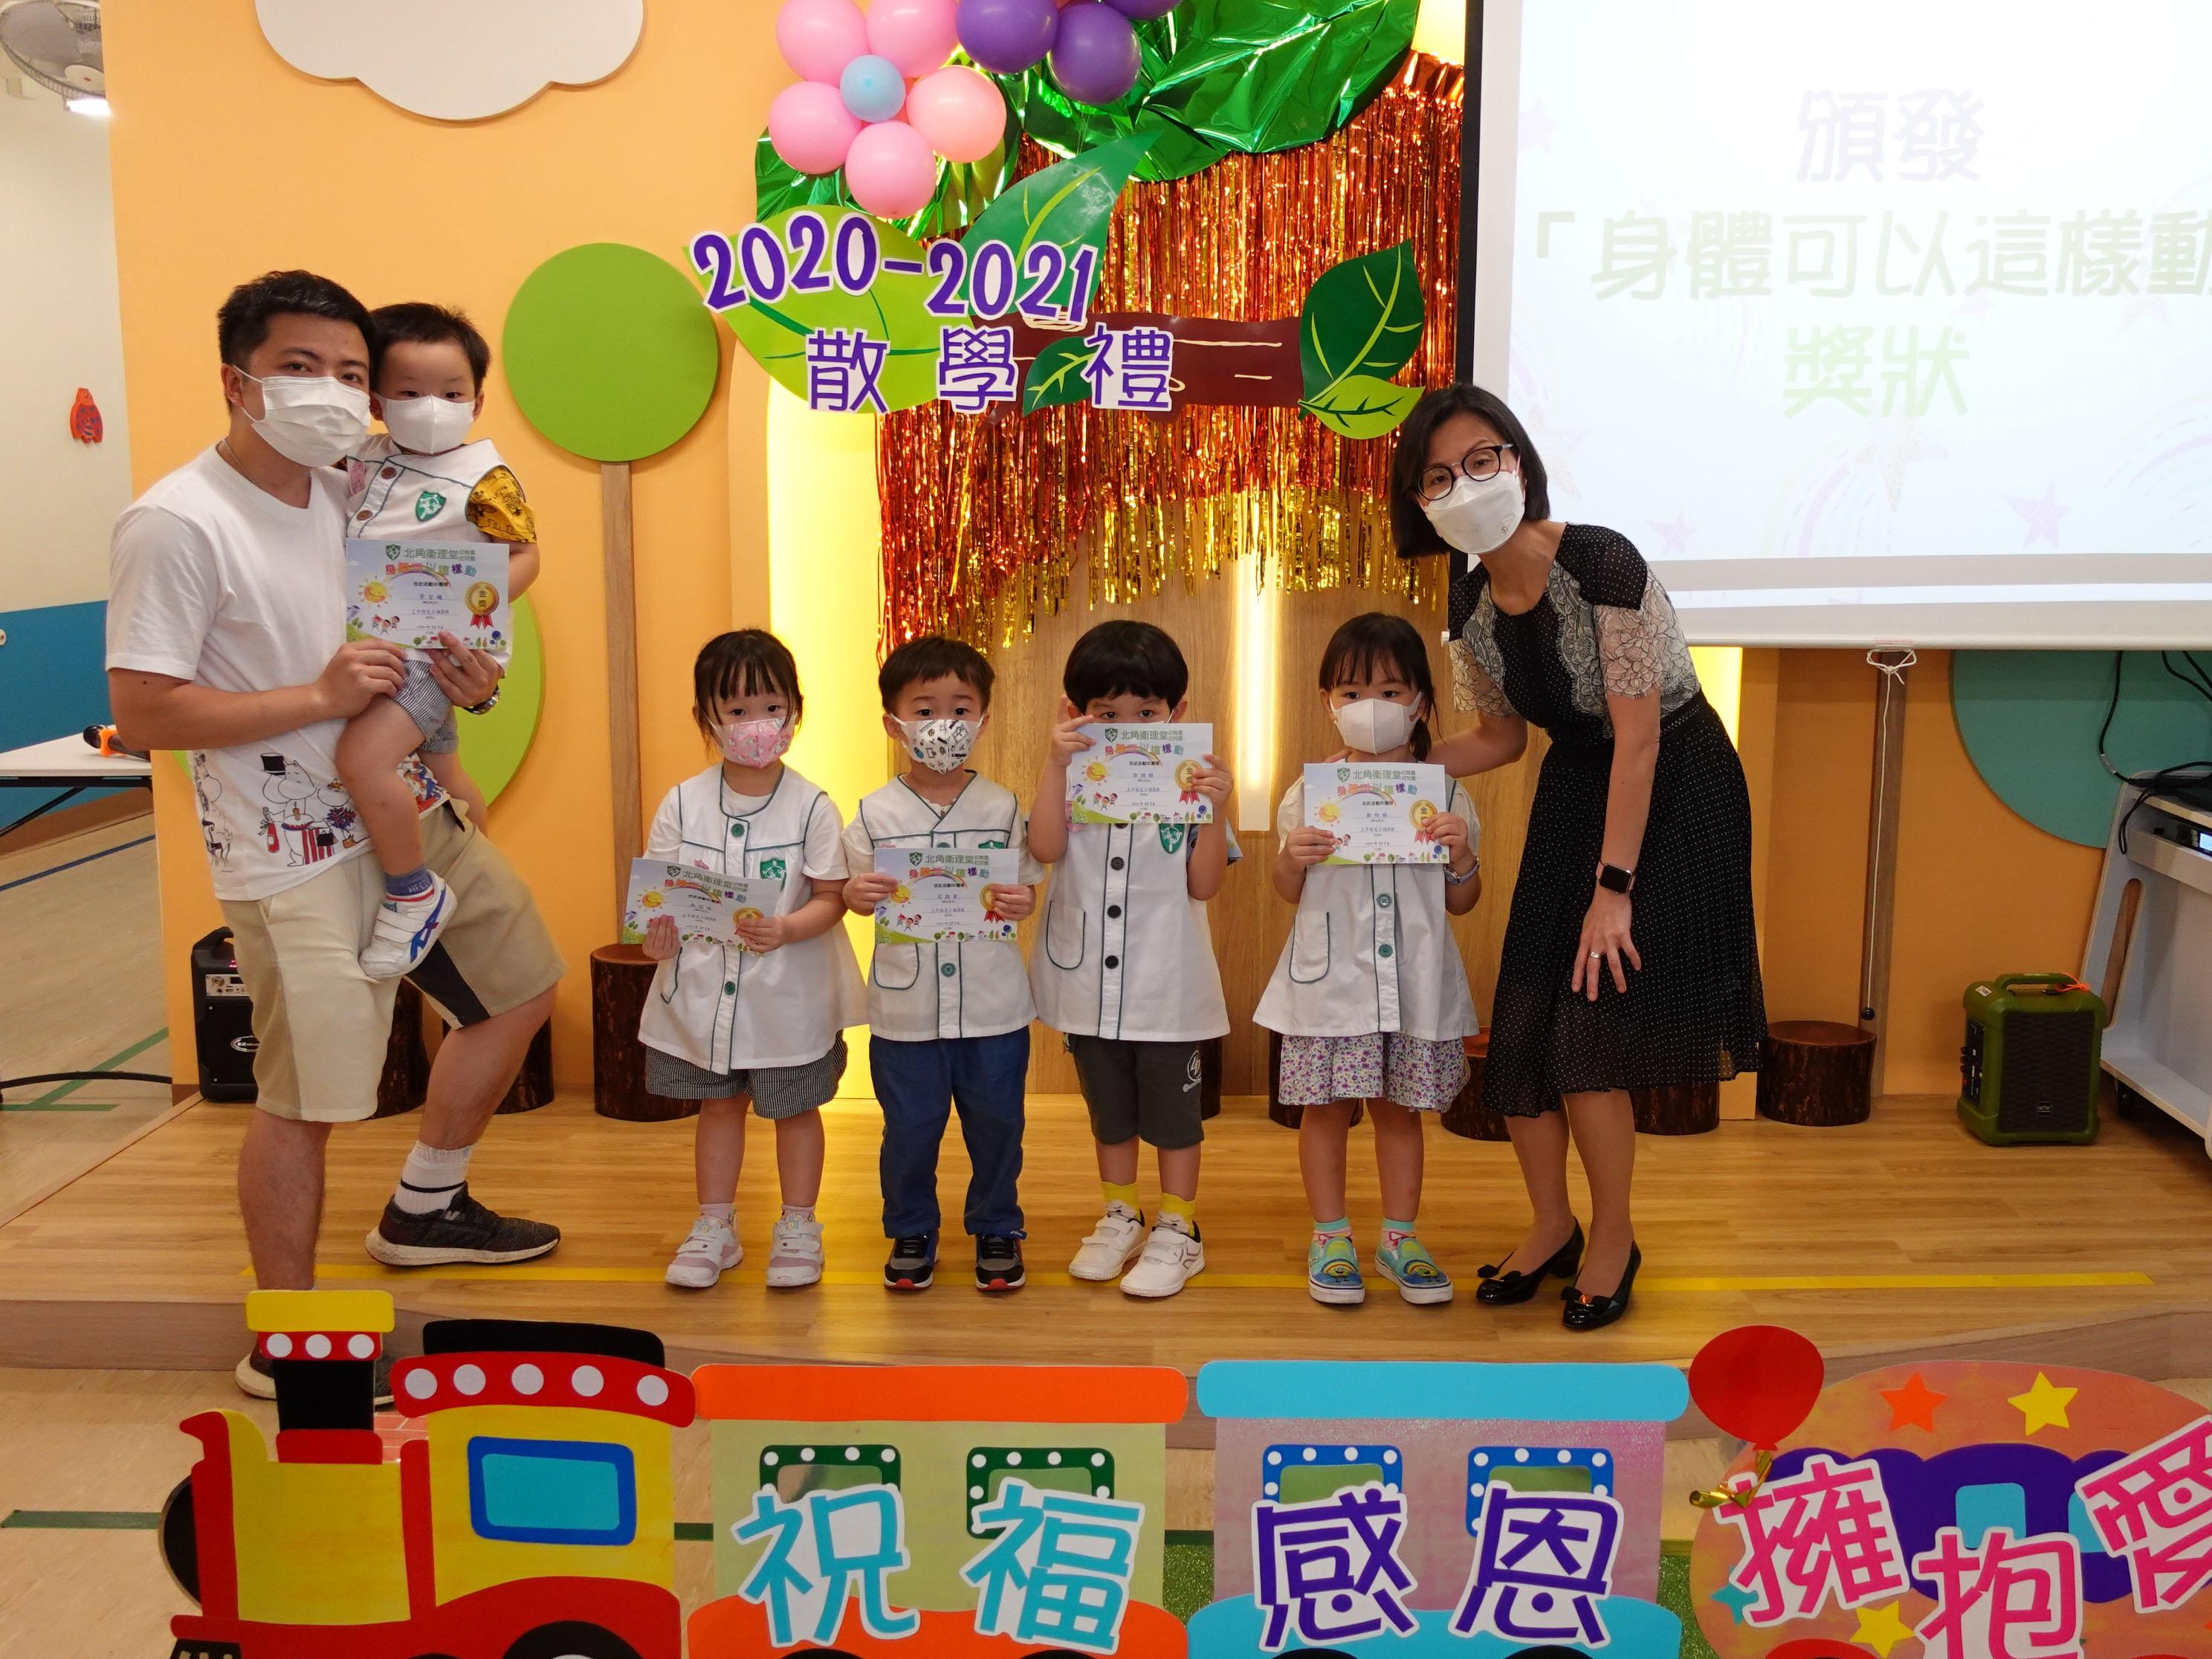 http://npmc.edu.hk/sites/default/files/7_1.jpg